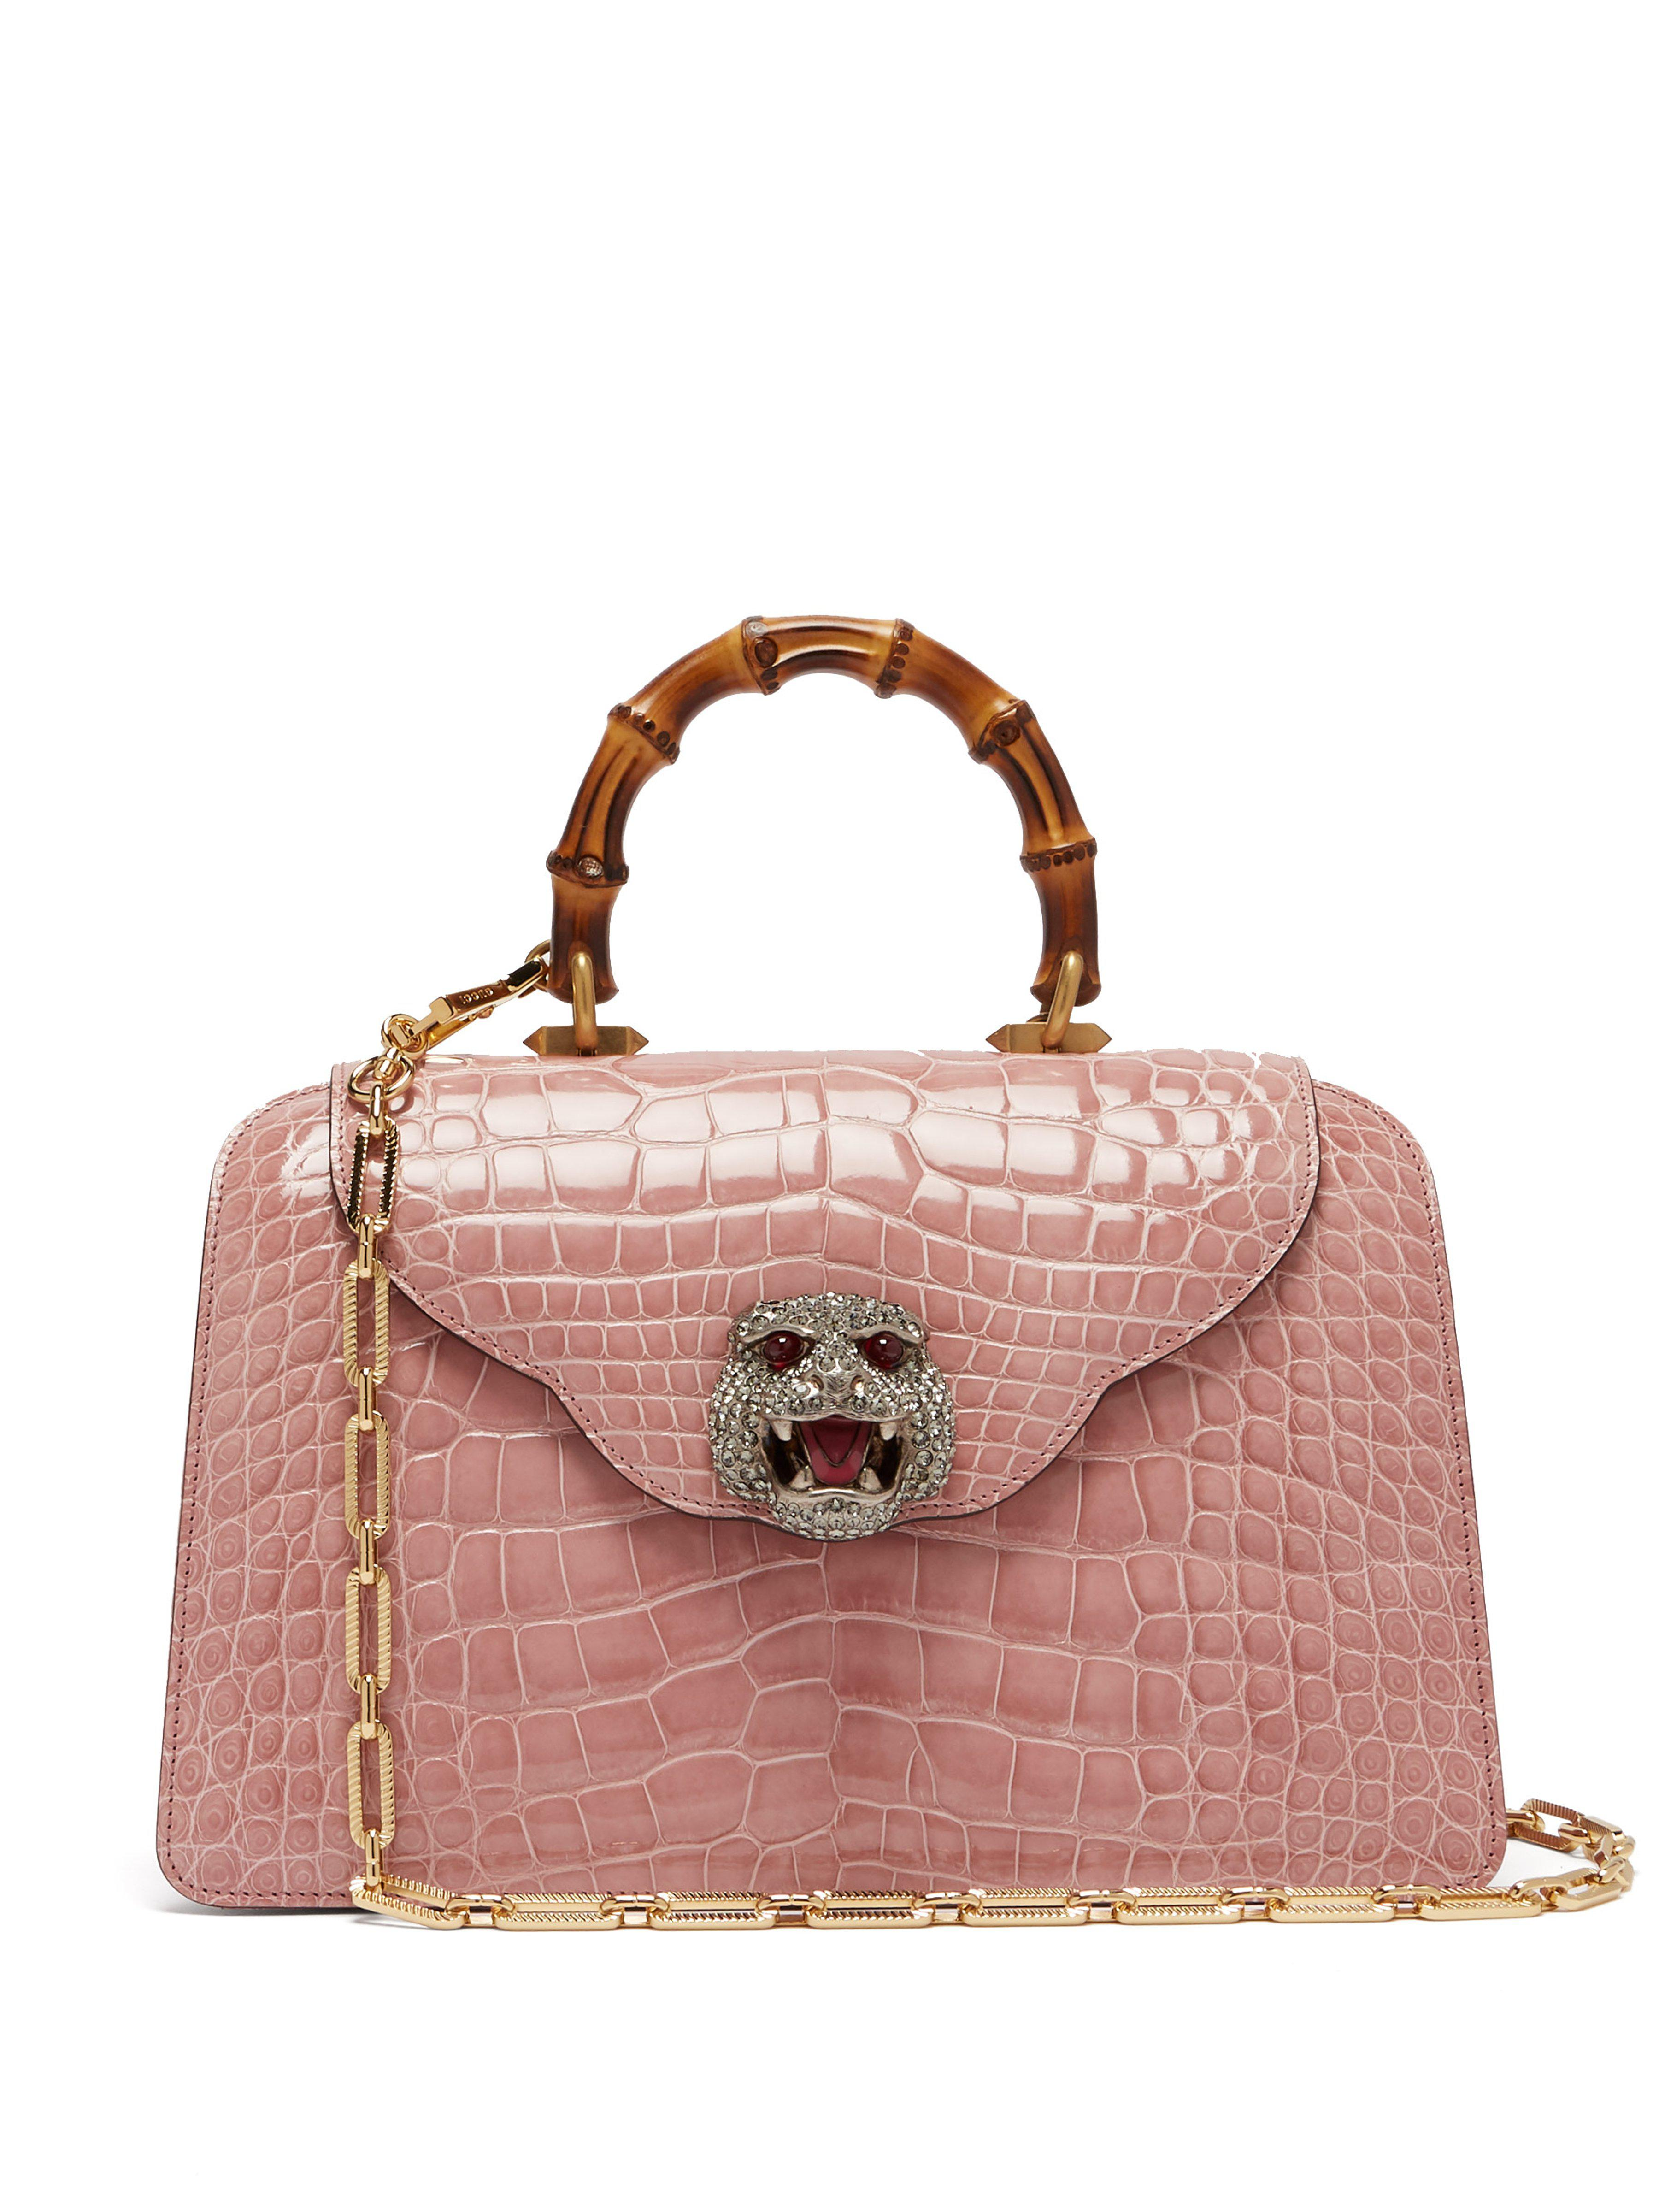 556bb1abad384 Gucci Thiara Bamboo Handle Crocodile Leather Bag in Pink - Lyst